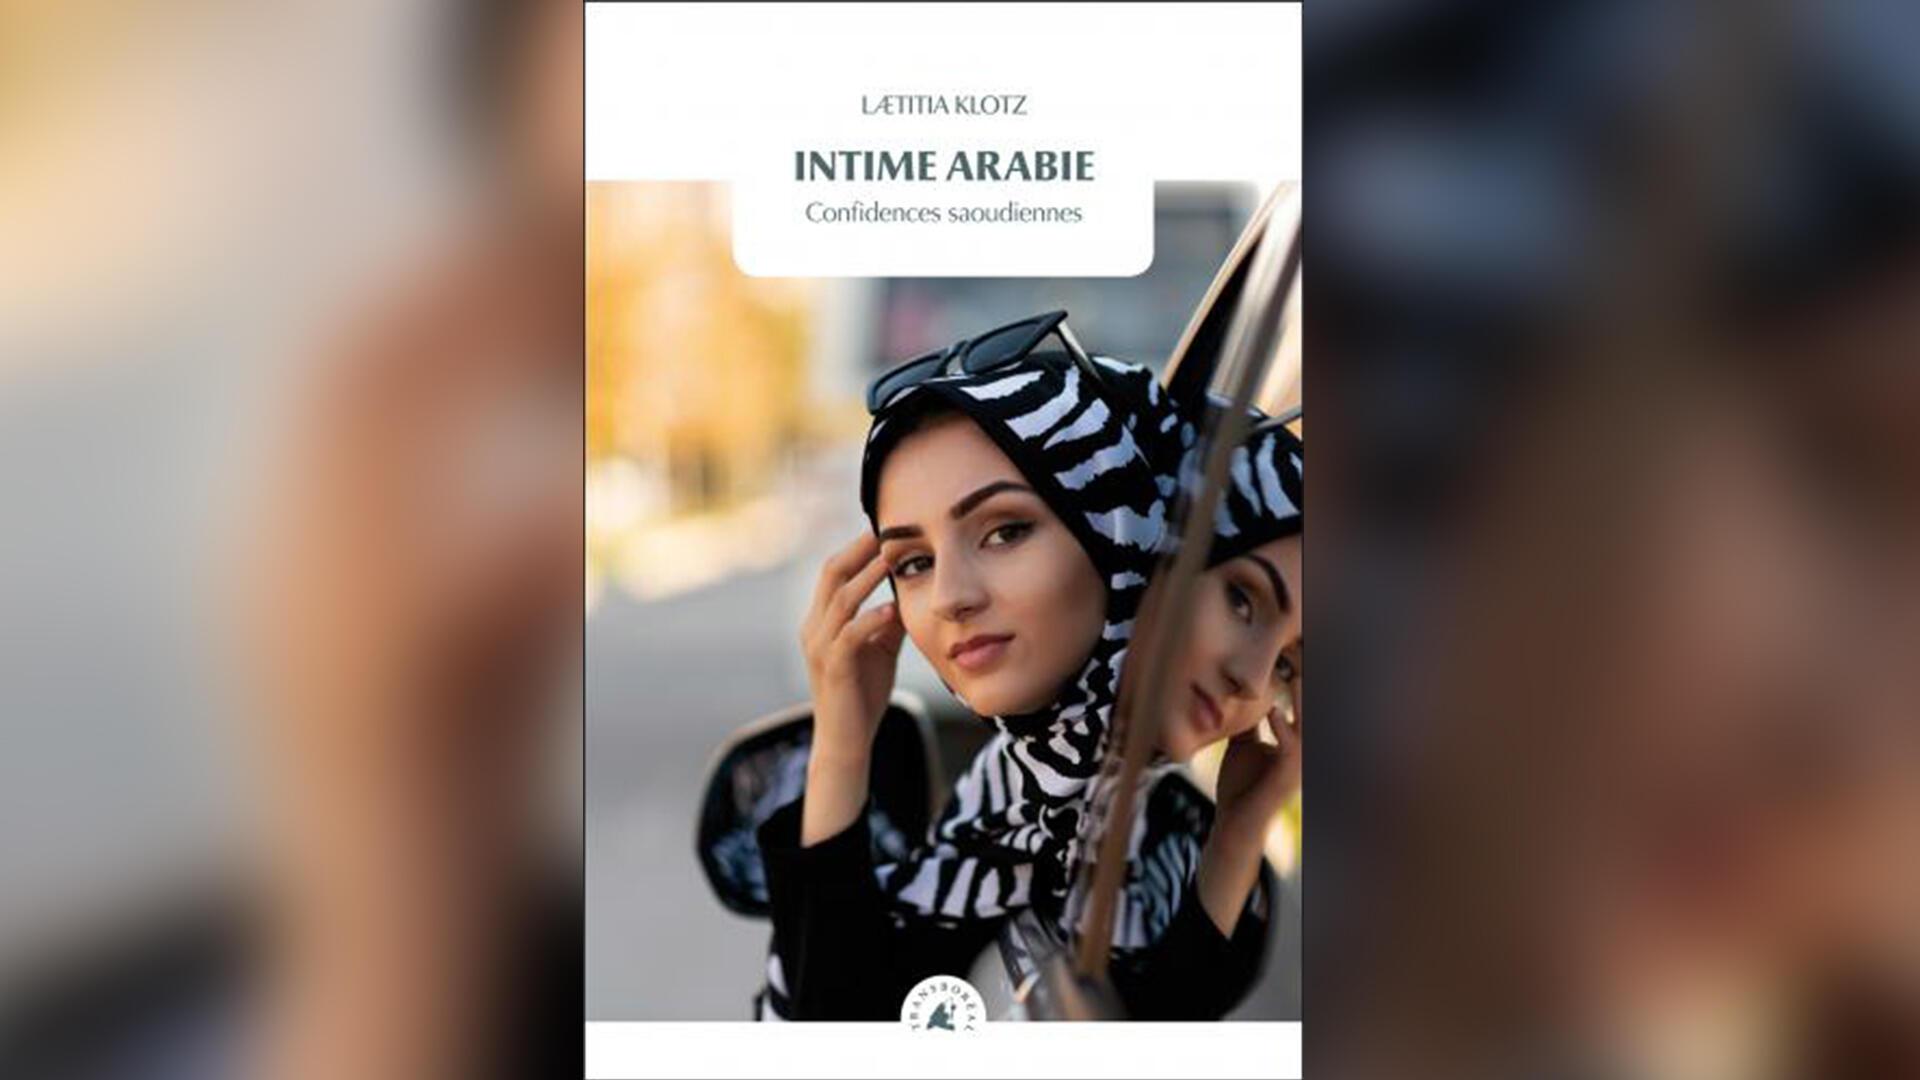 intime-arabie-lætitia-klotz